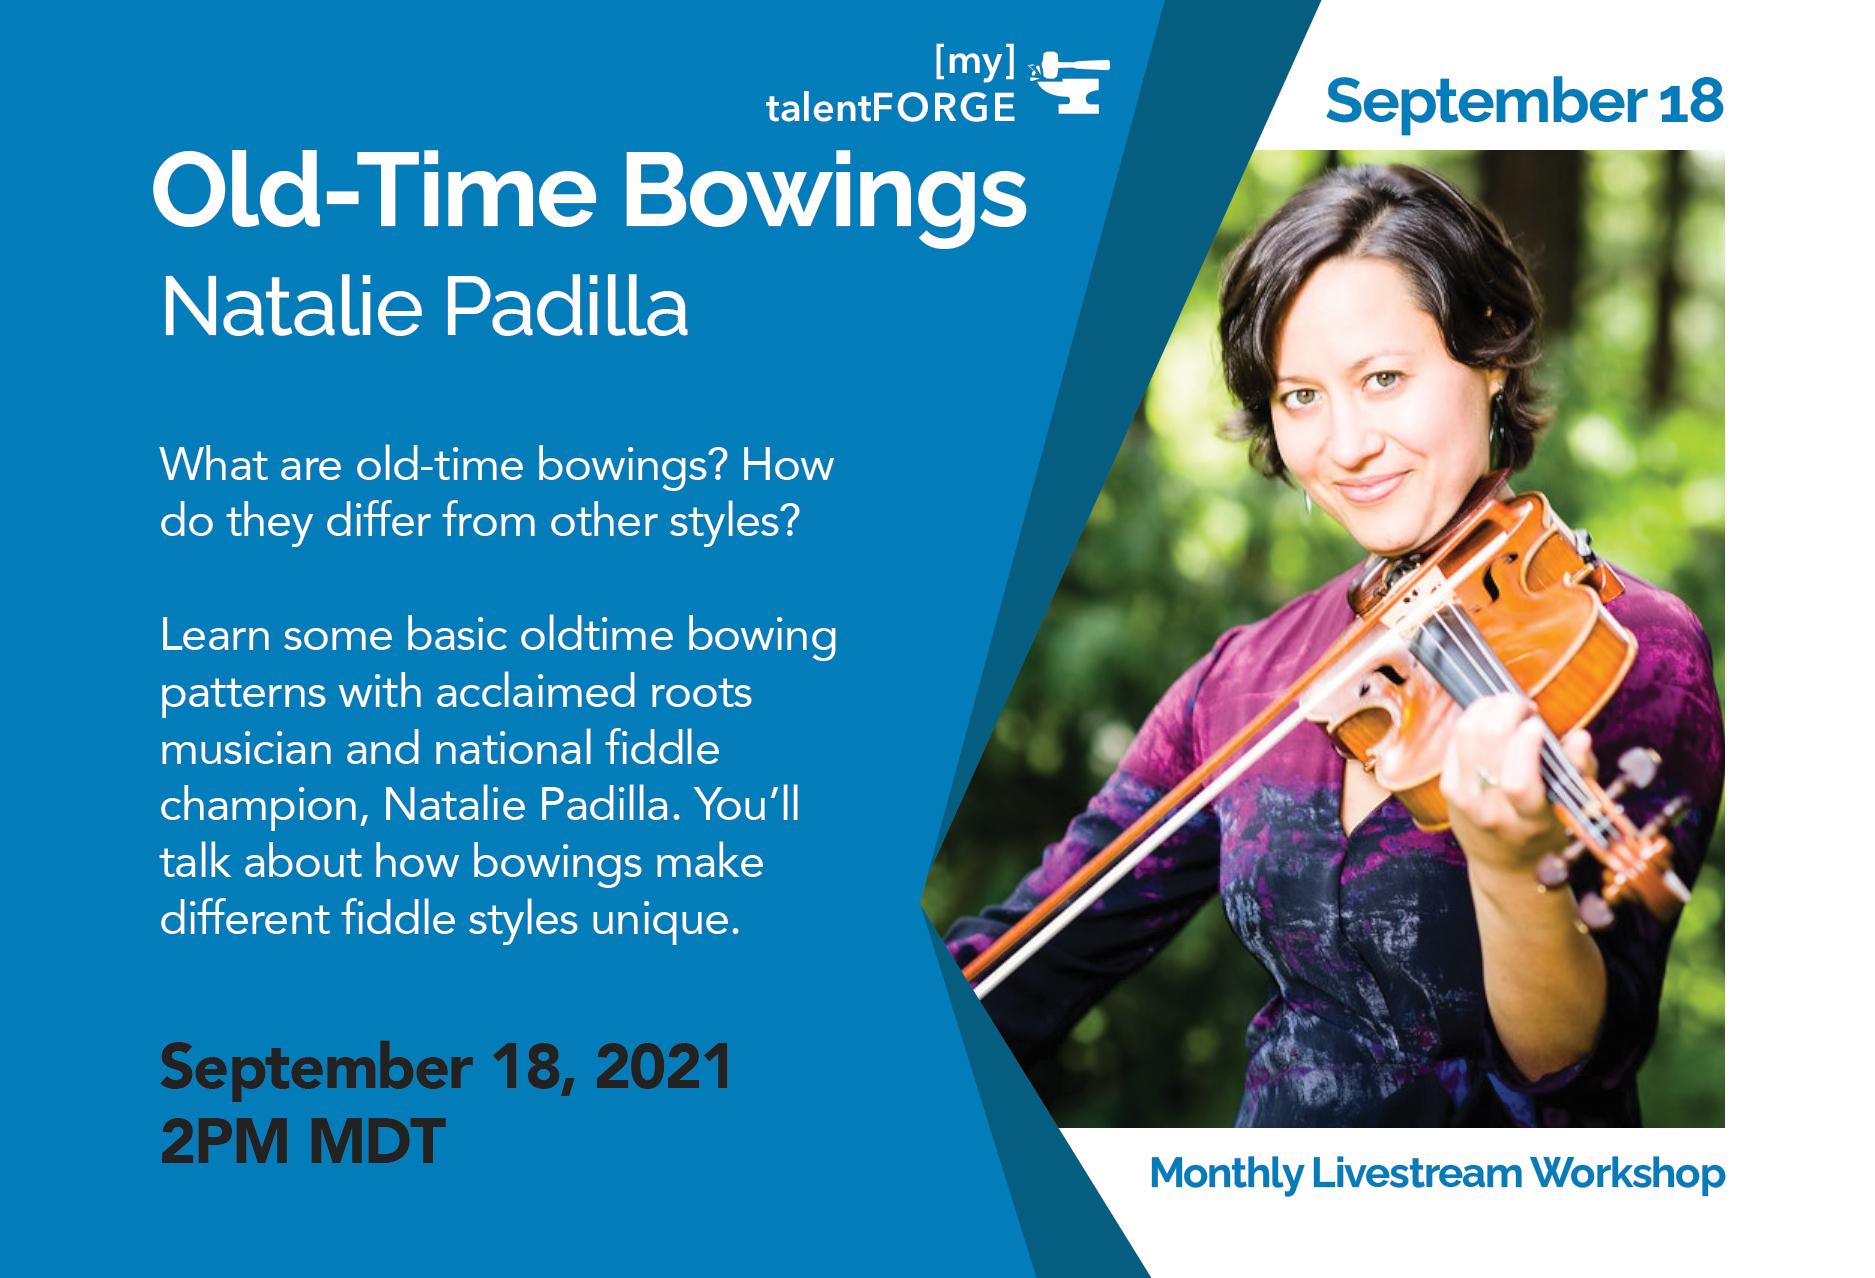 Old-Time Bowings - Natalie Padilla Livestream Workshop